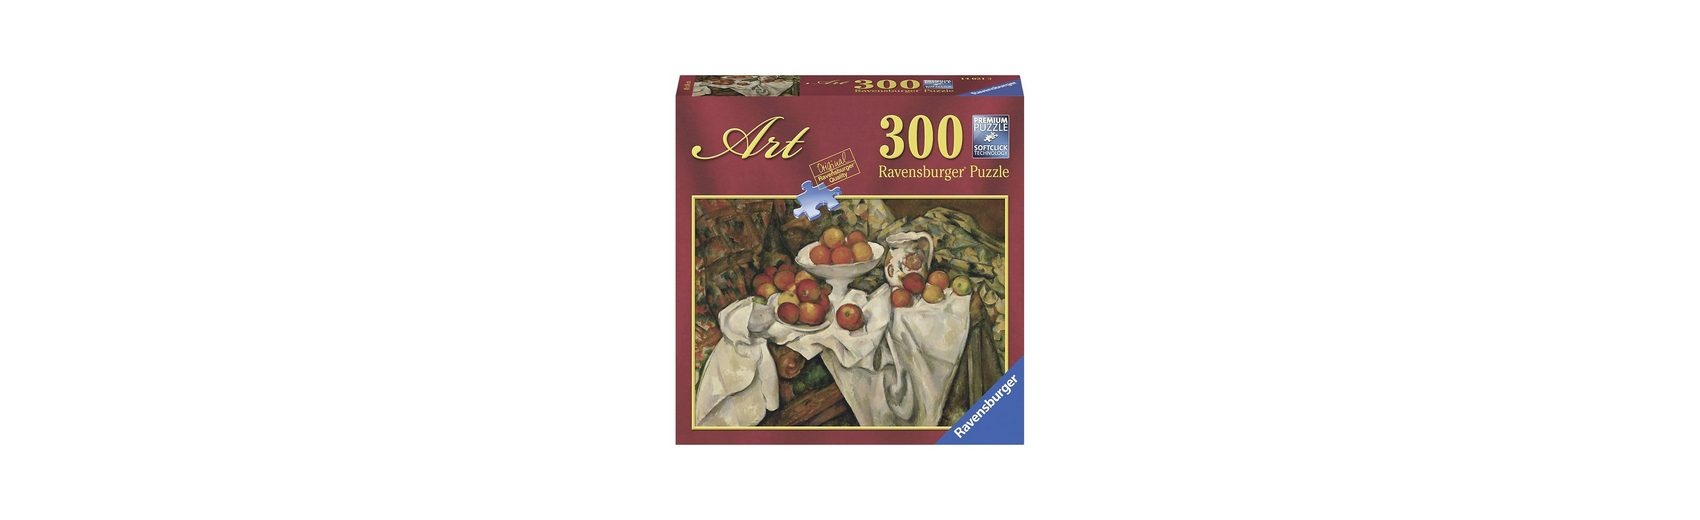 Ravensburger Puzzle 300 Teile Cézanne: Stillleben